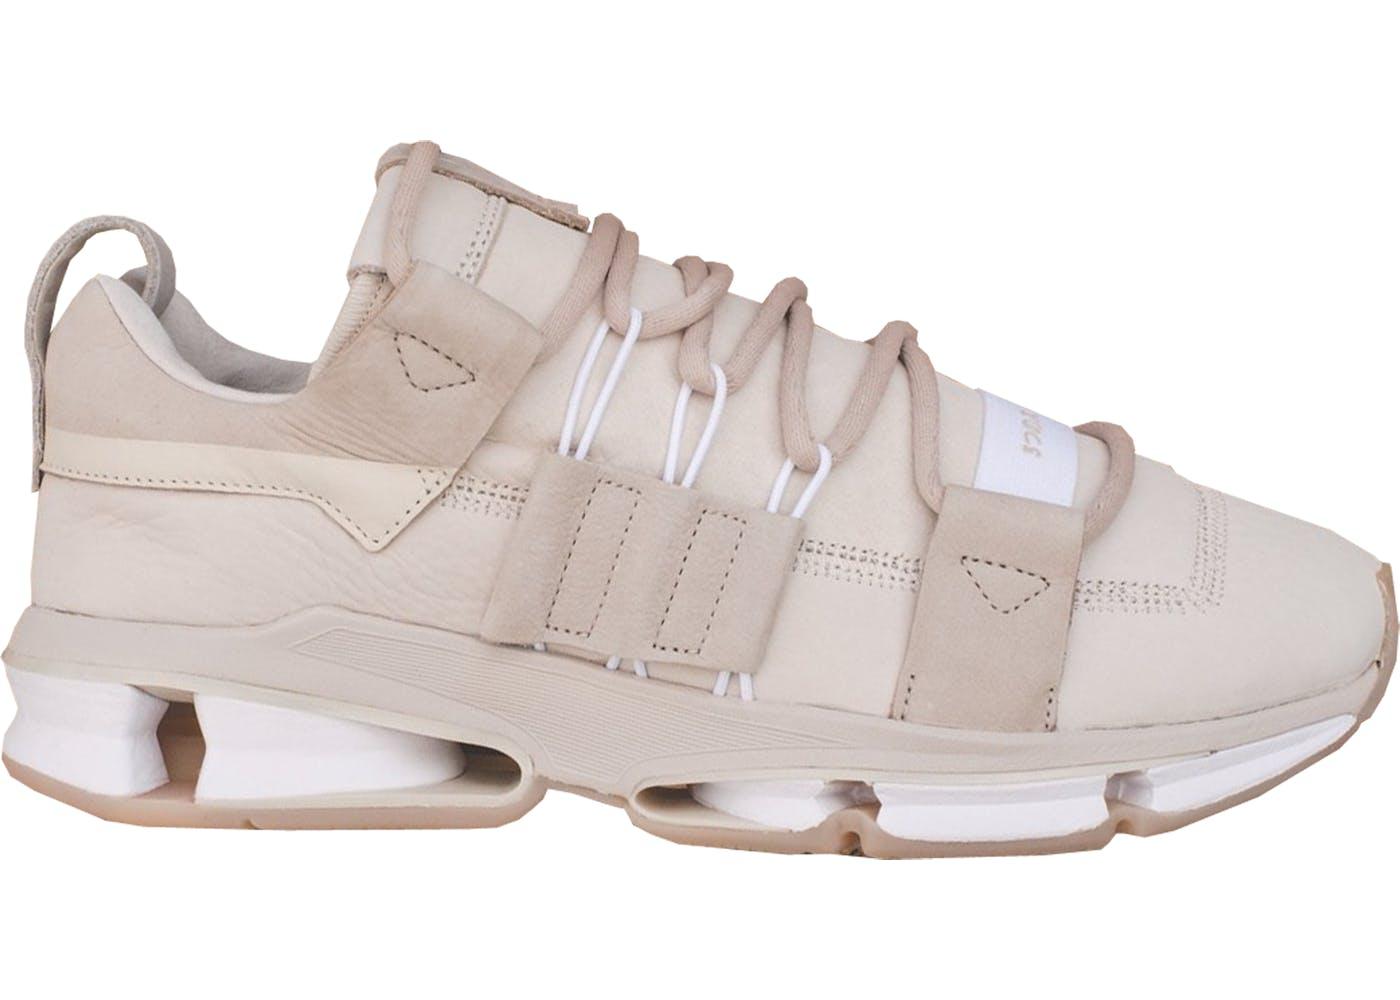 b48276c3c3343 kith nonnative adidas ultra boost twinstrike adv